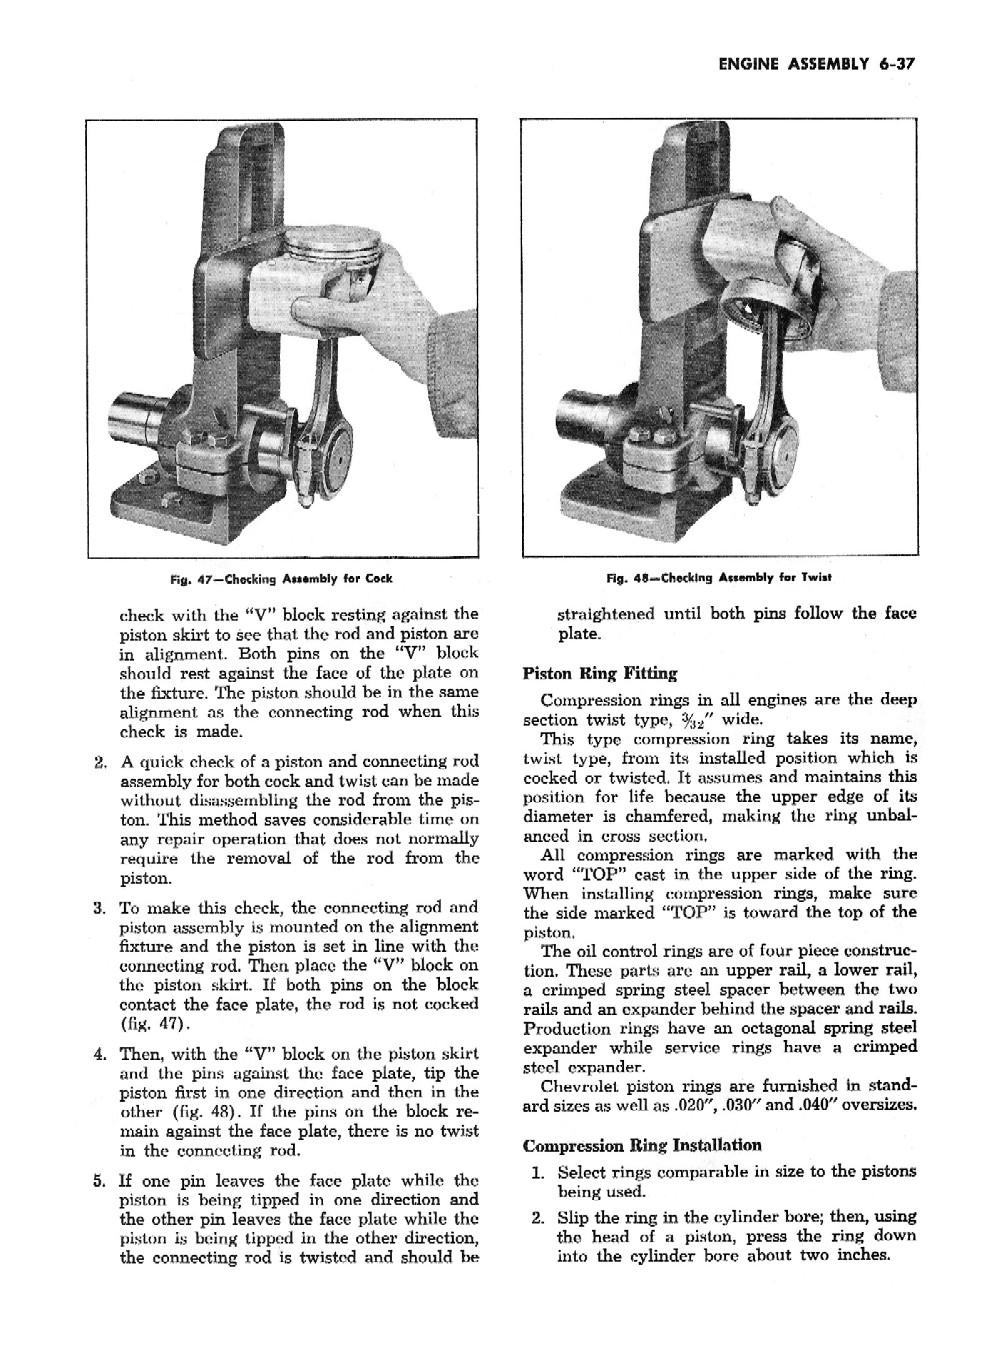 1955 Chevrolet Passenger Car Shop Manual